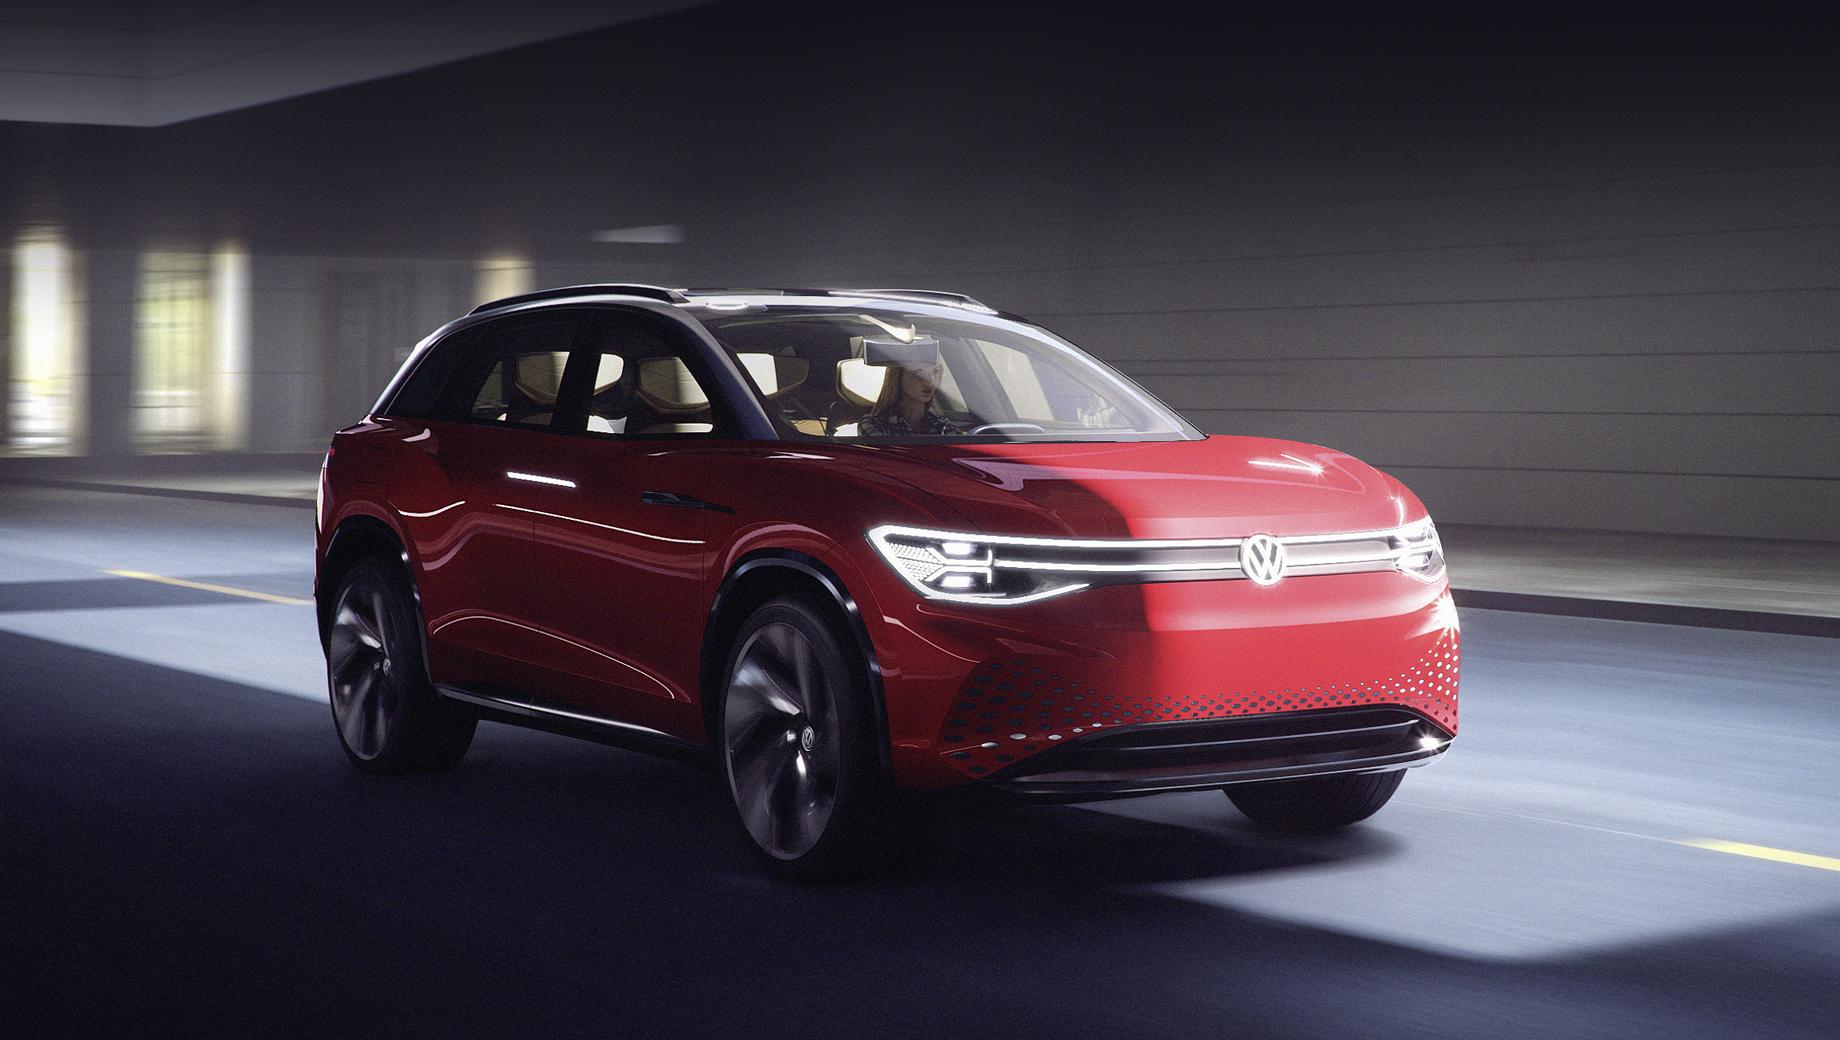 Кроссовер Volkswagen ID. Roomzz станет прерогативой Китая